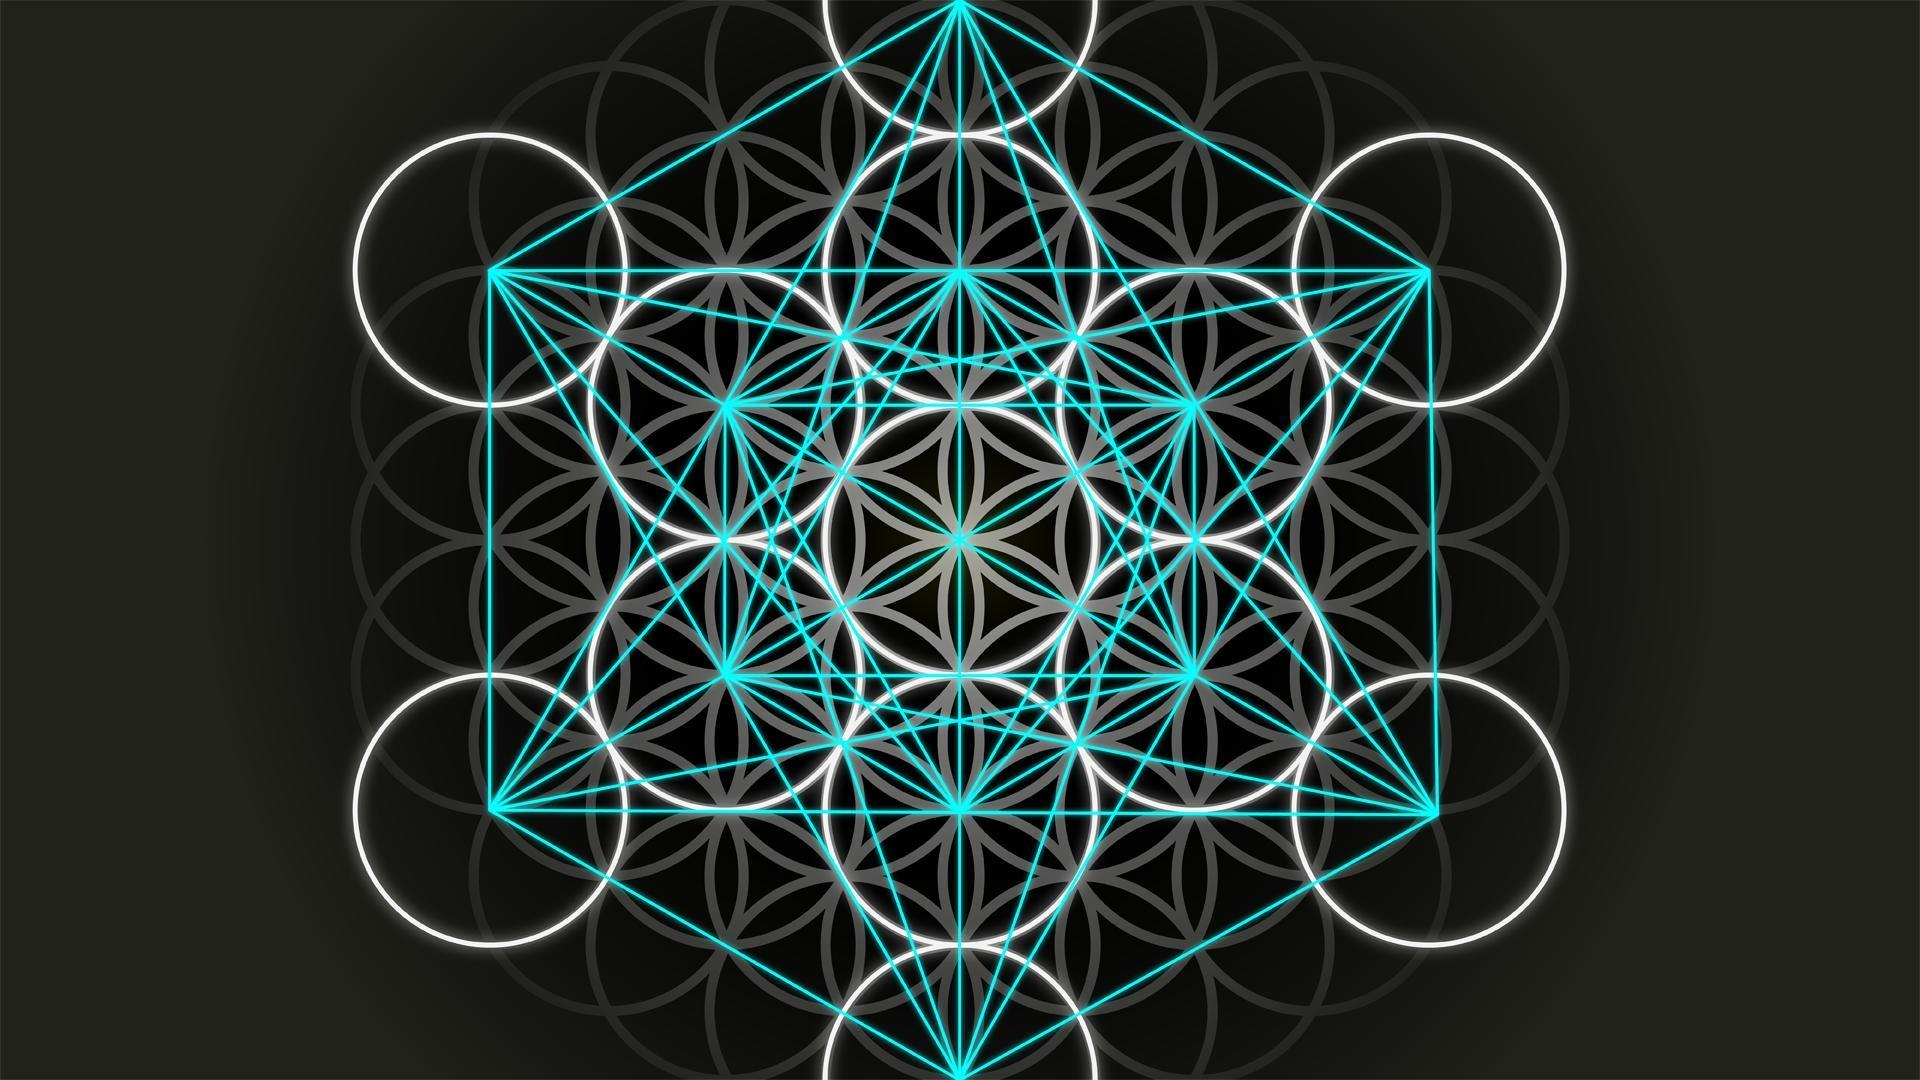 Sacred Geometry Art Wallpaper Pretty sweet wallpaper of